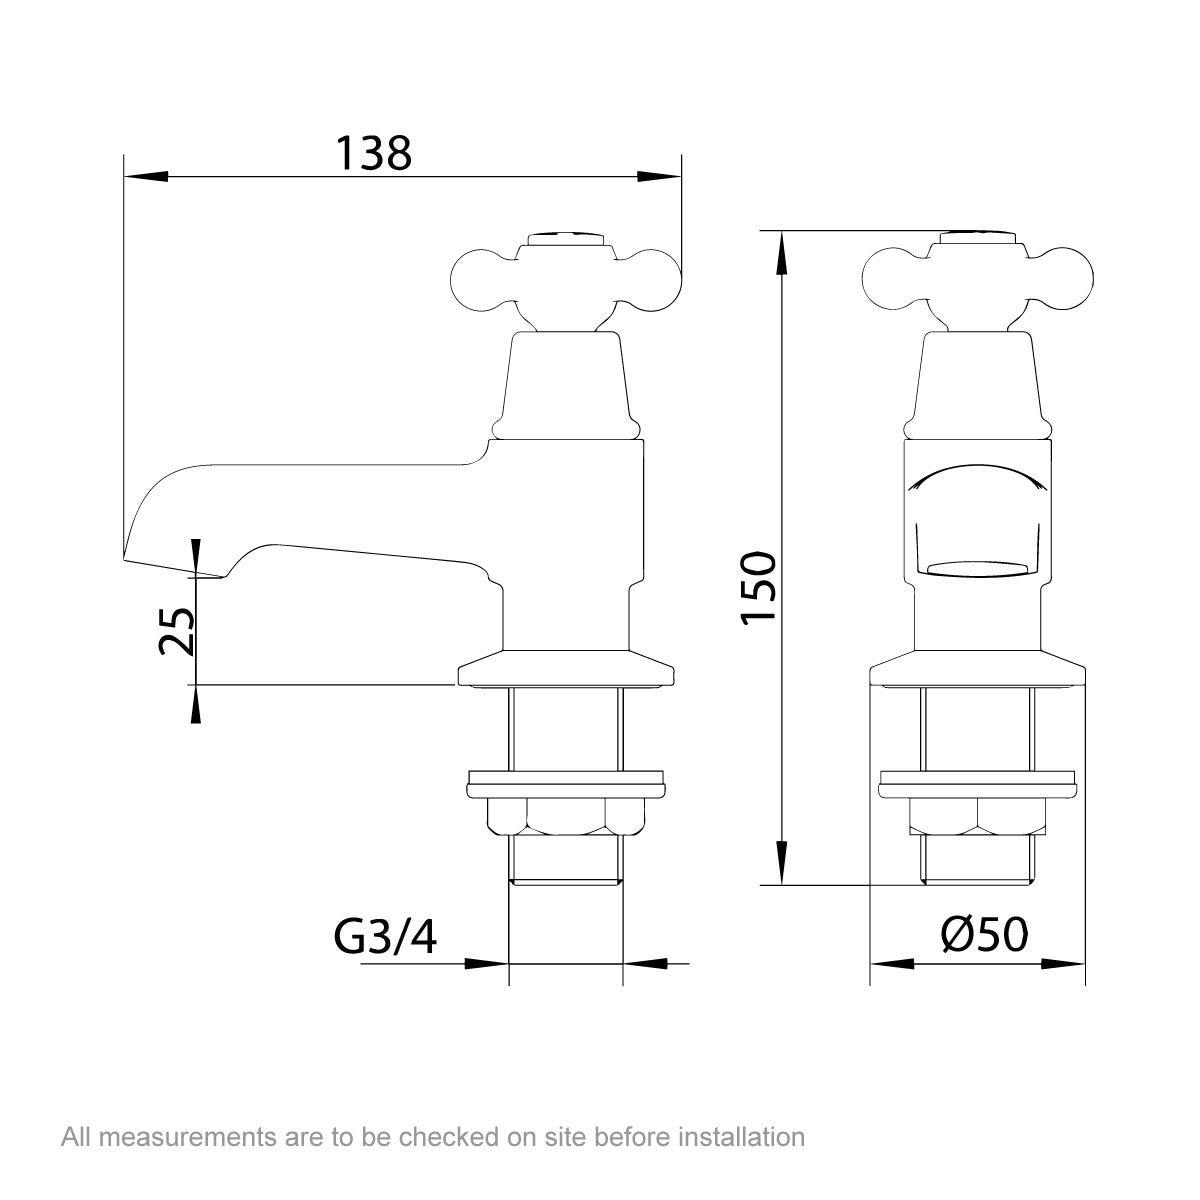 Dimensions for The Bath Co. Camberley bath pillar taps